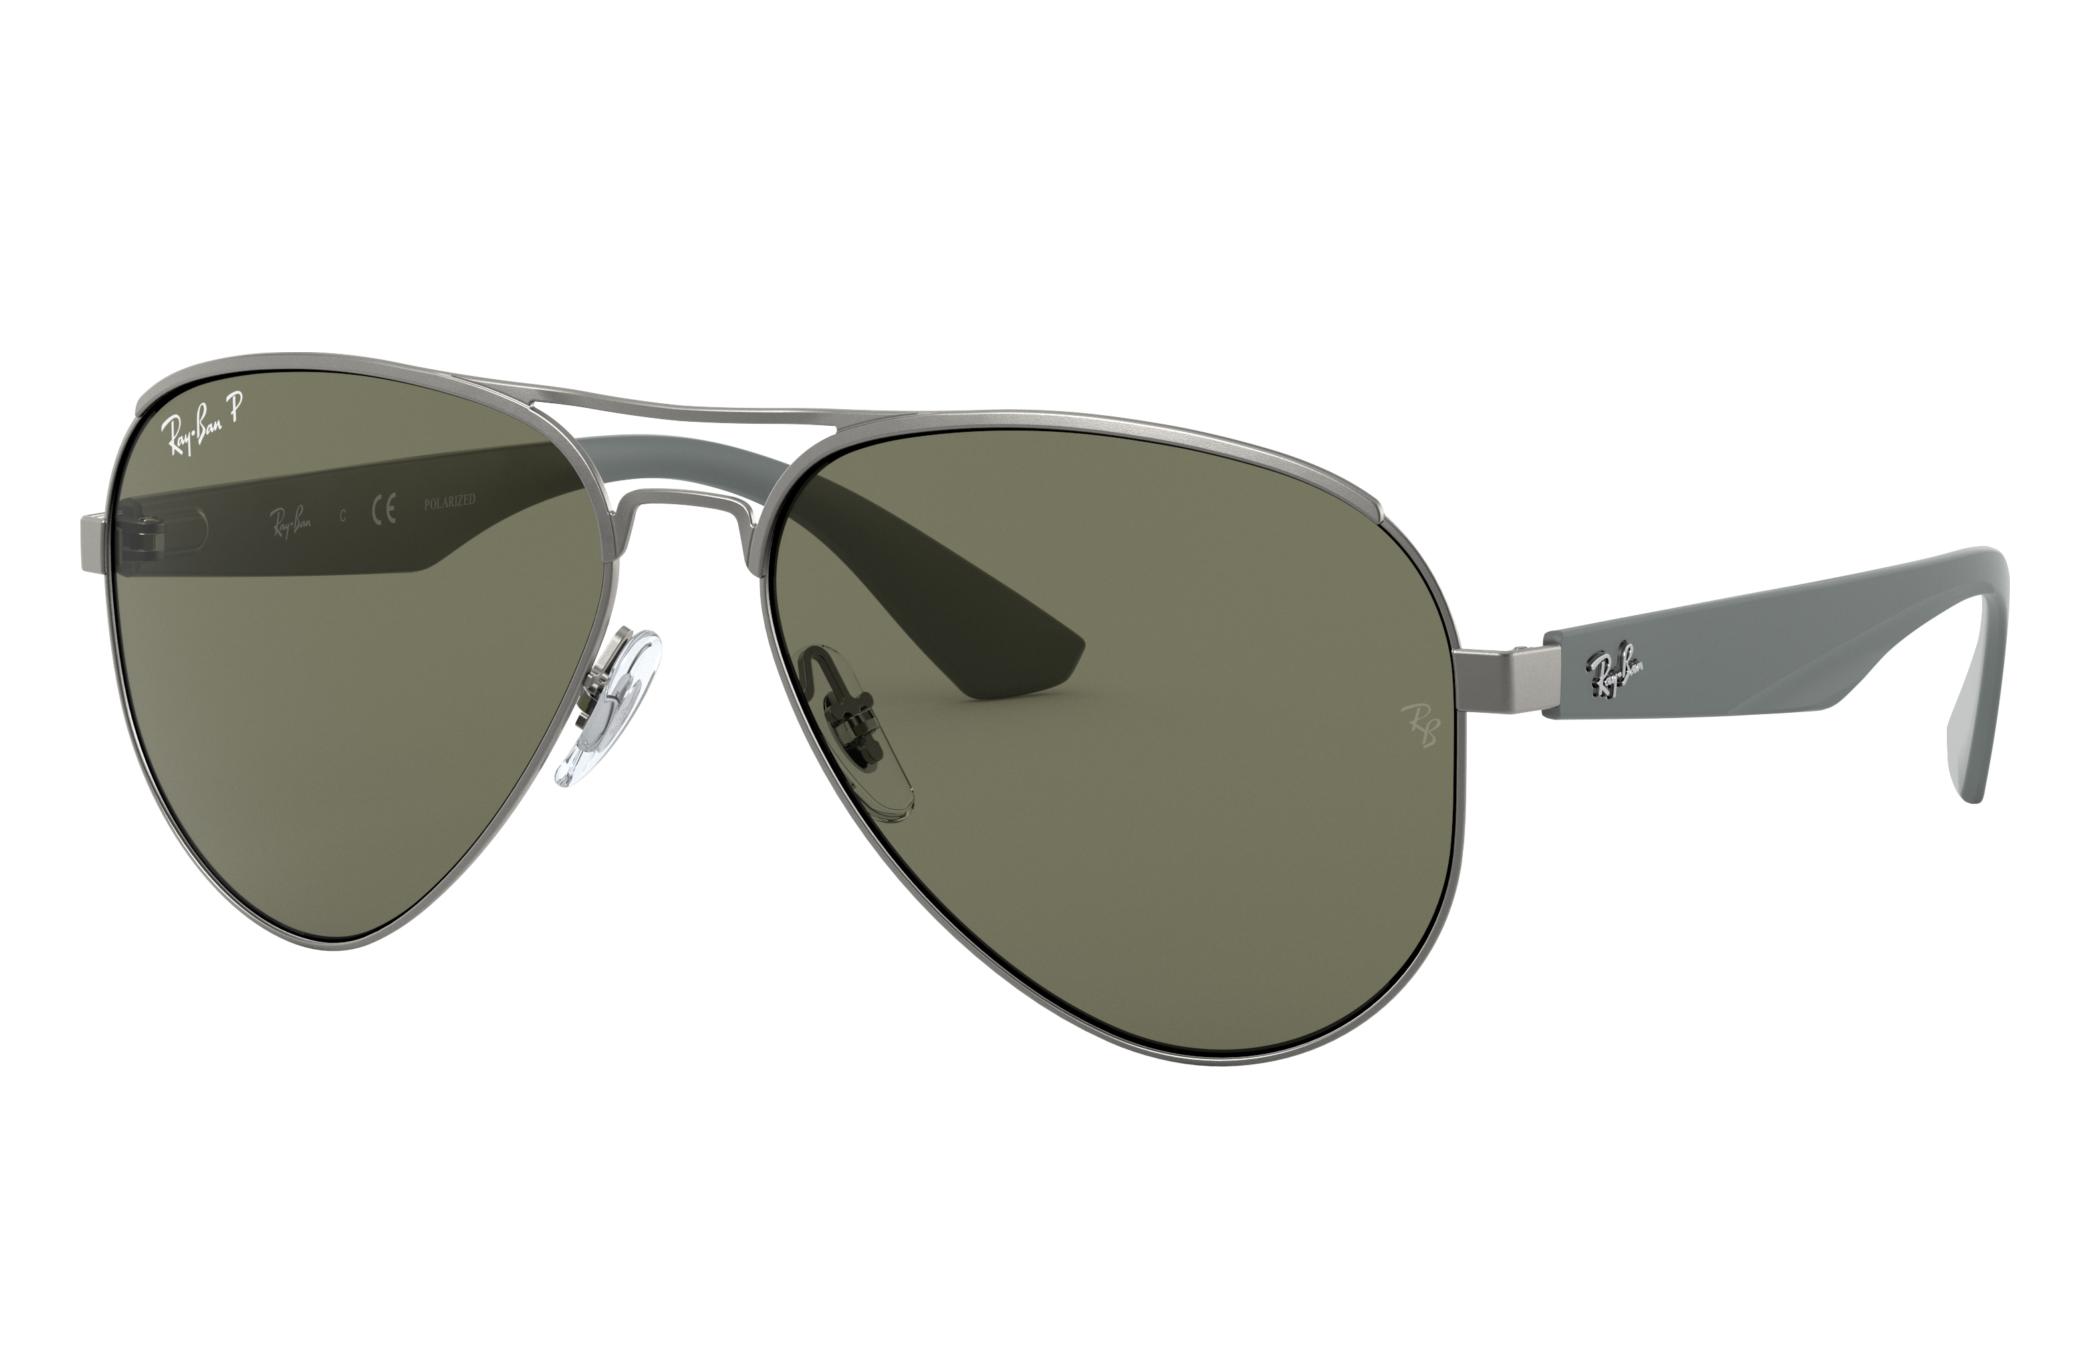 Ray-Ban Rb3523 Grey, Polarized Green Lenses - RB3523